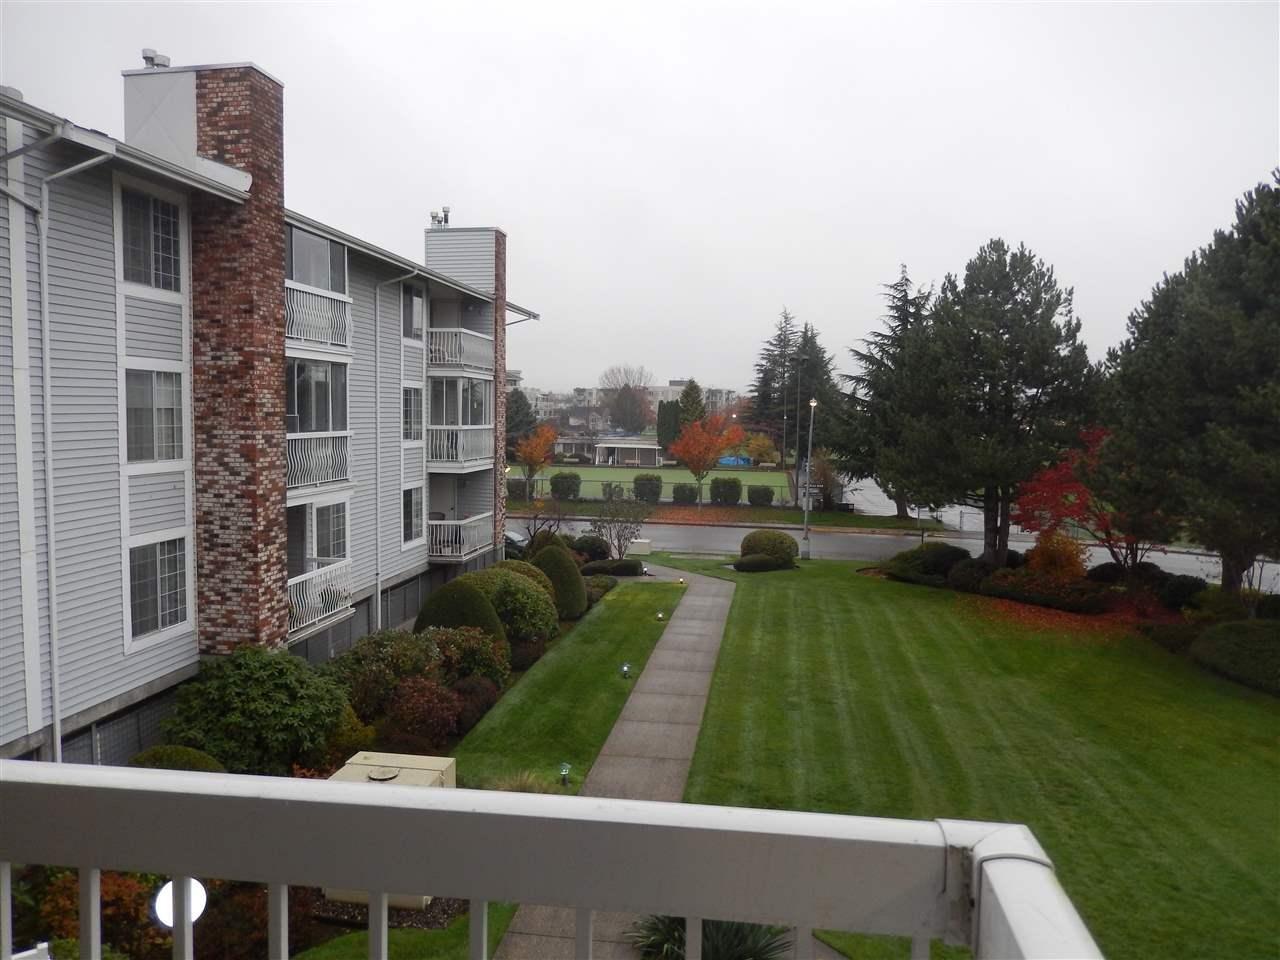 R2013875 - 226 5379 205 STREET, Langley City, Langley, BC - Apartment Unit